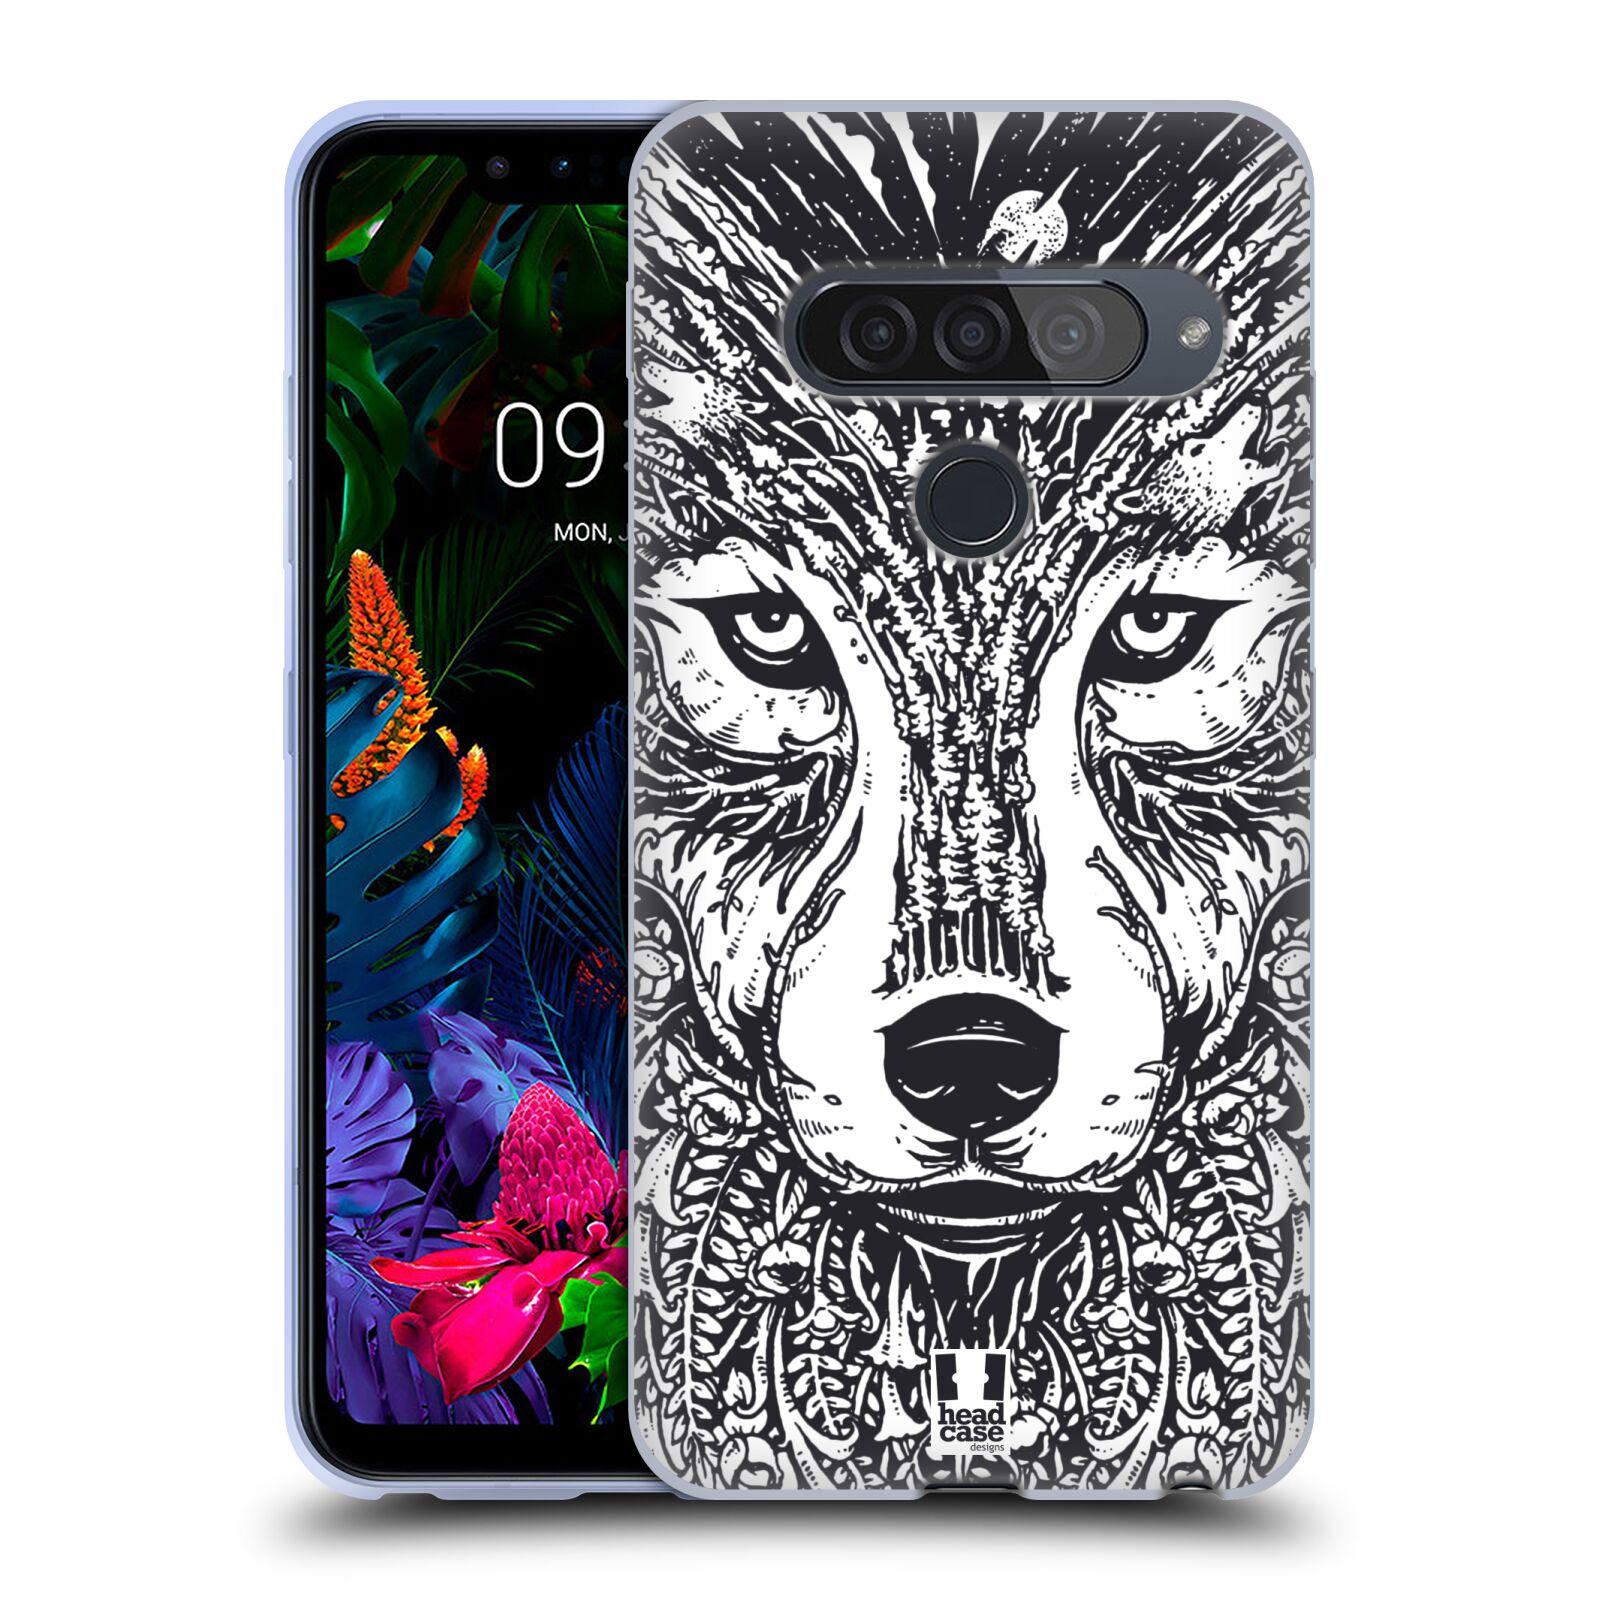 Silikonové pouzdro na mobil LG G8s ThinQ - Head Case - DOODLE TVÁŘ VLK